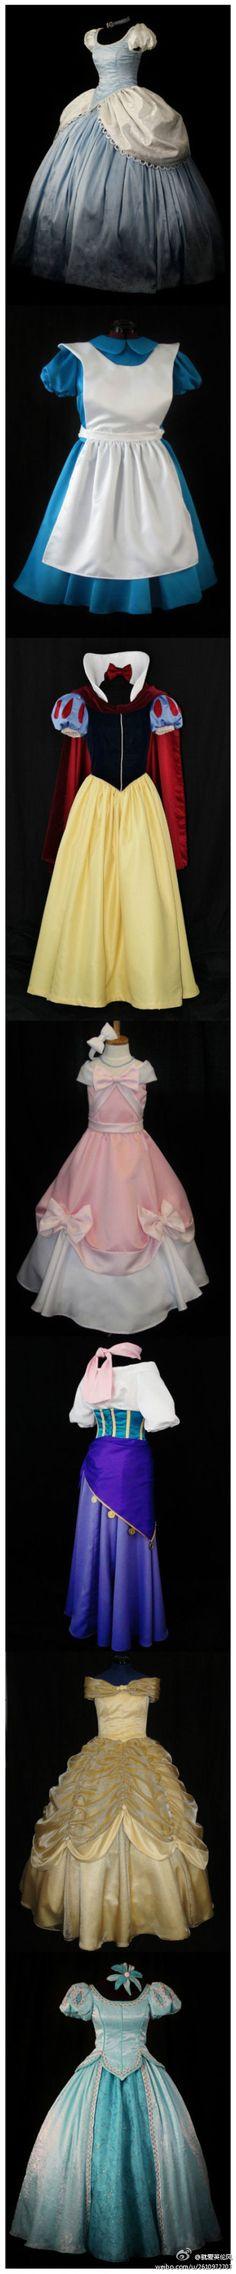 To be a princess :)